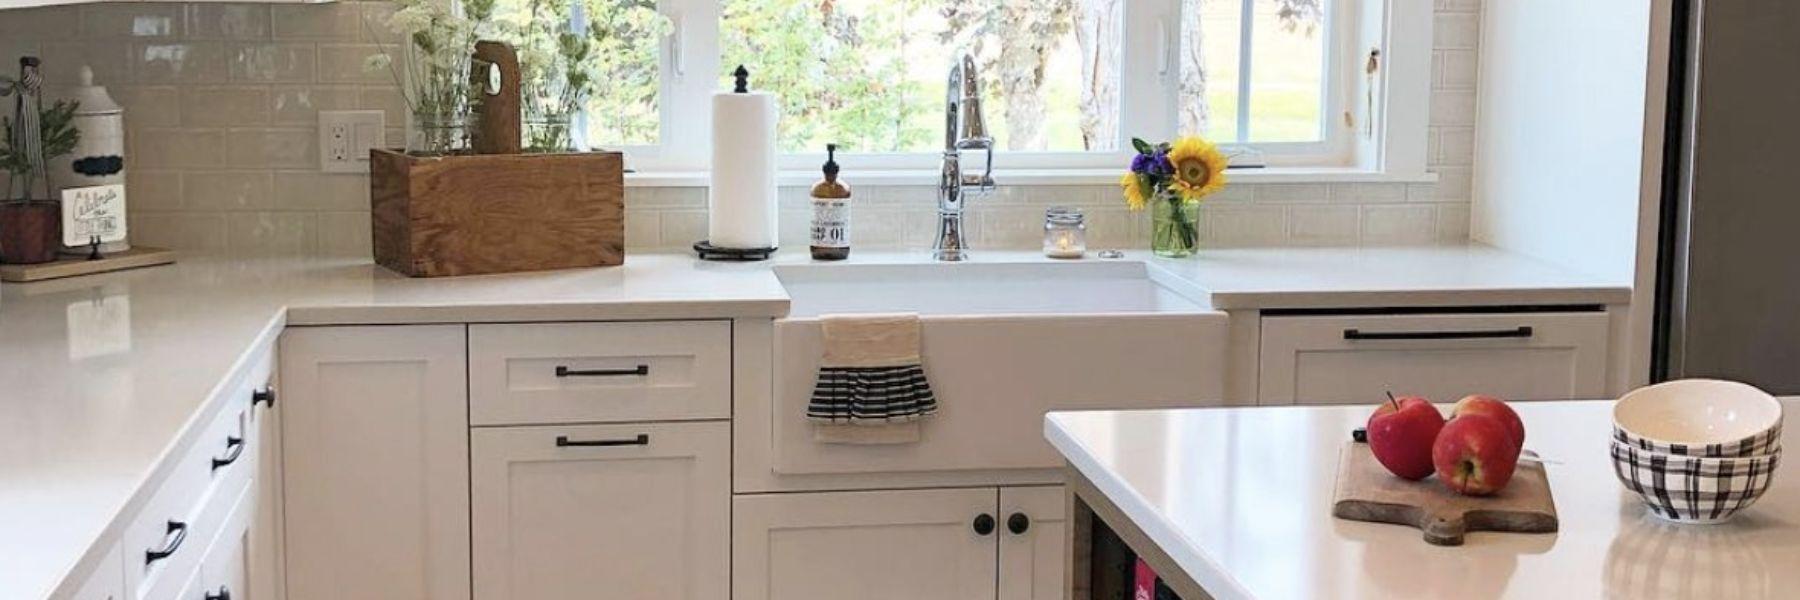 farmhouse kitchen view of the sink